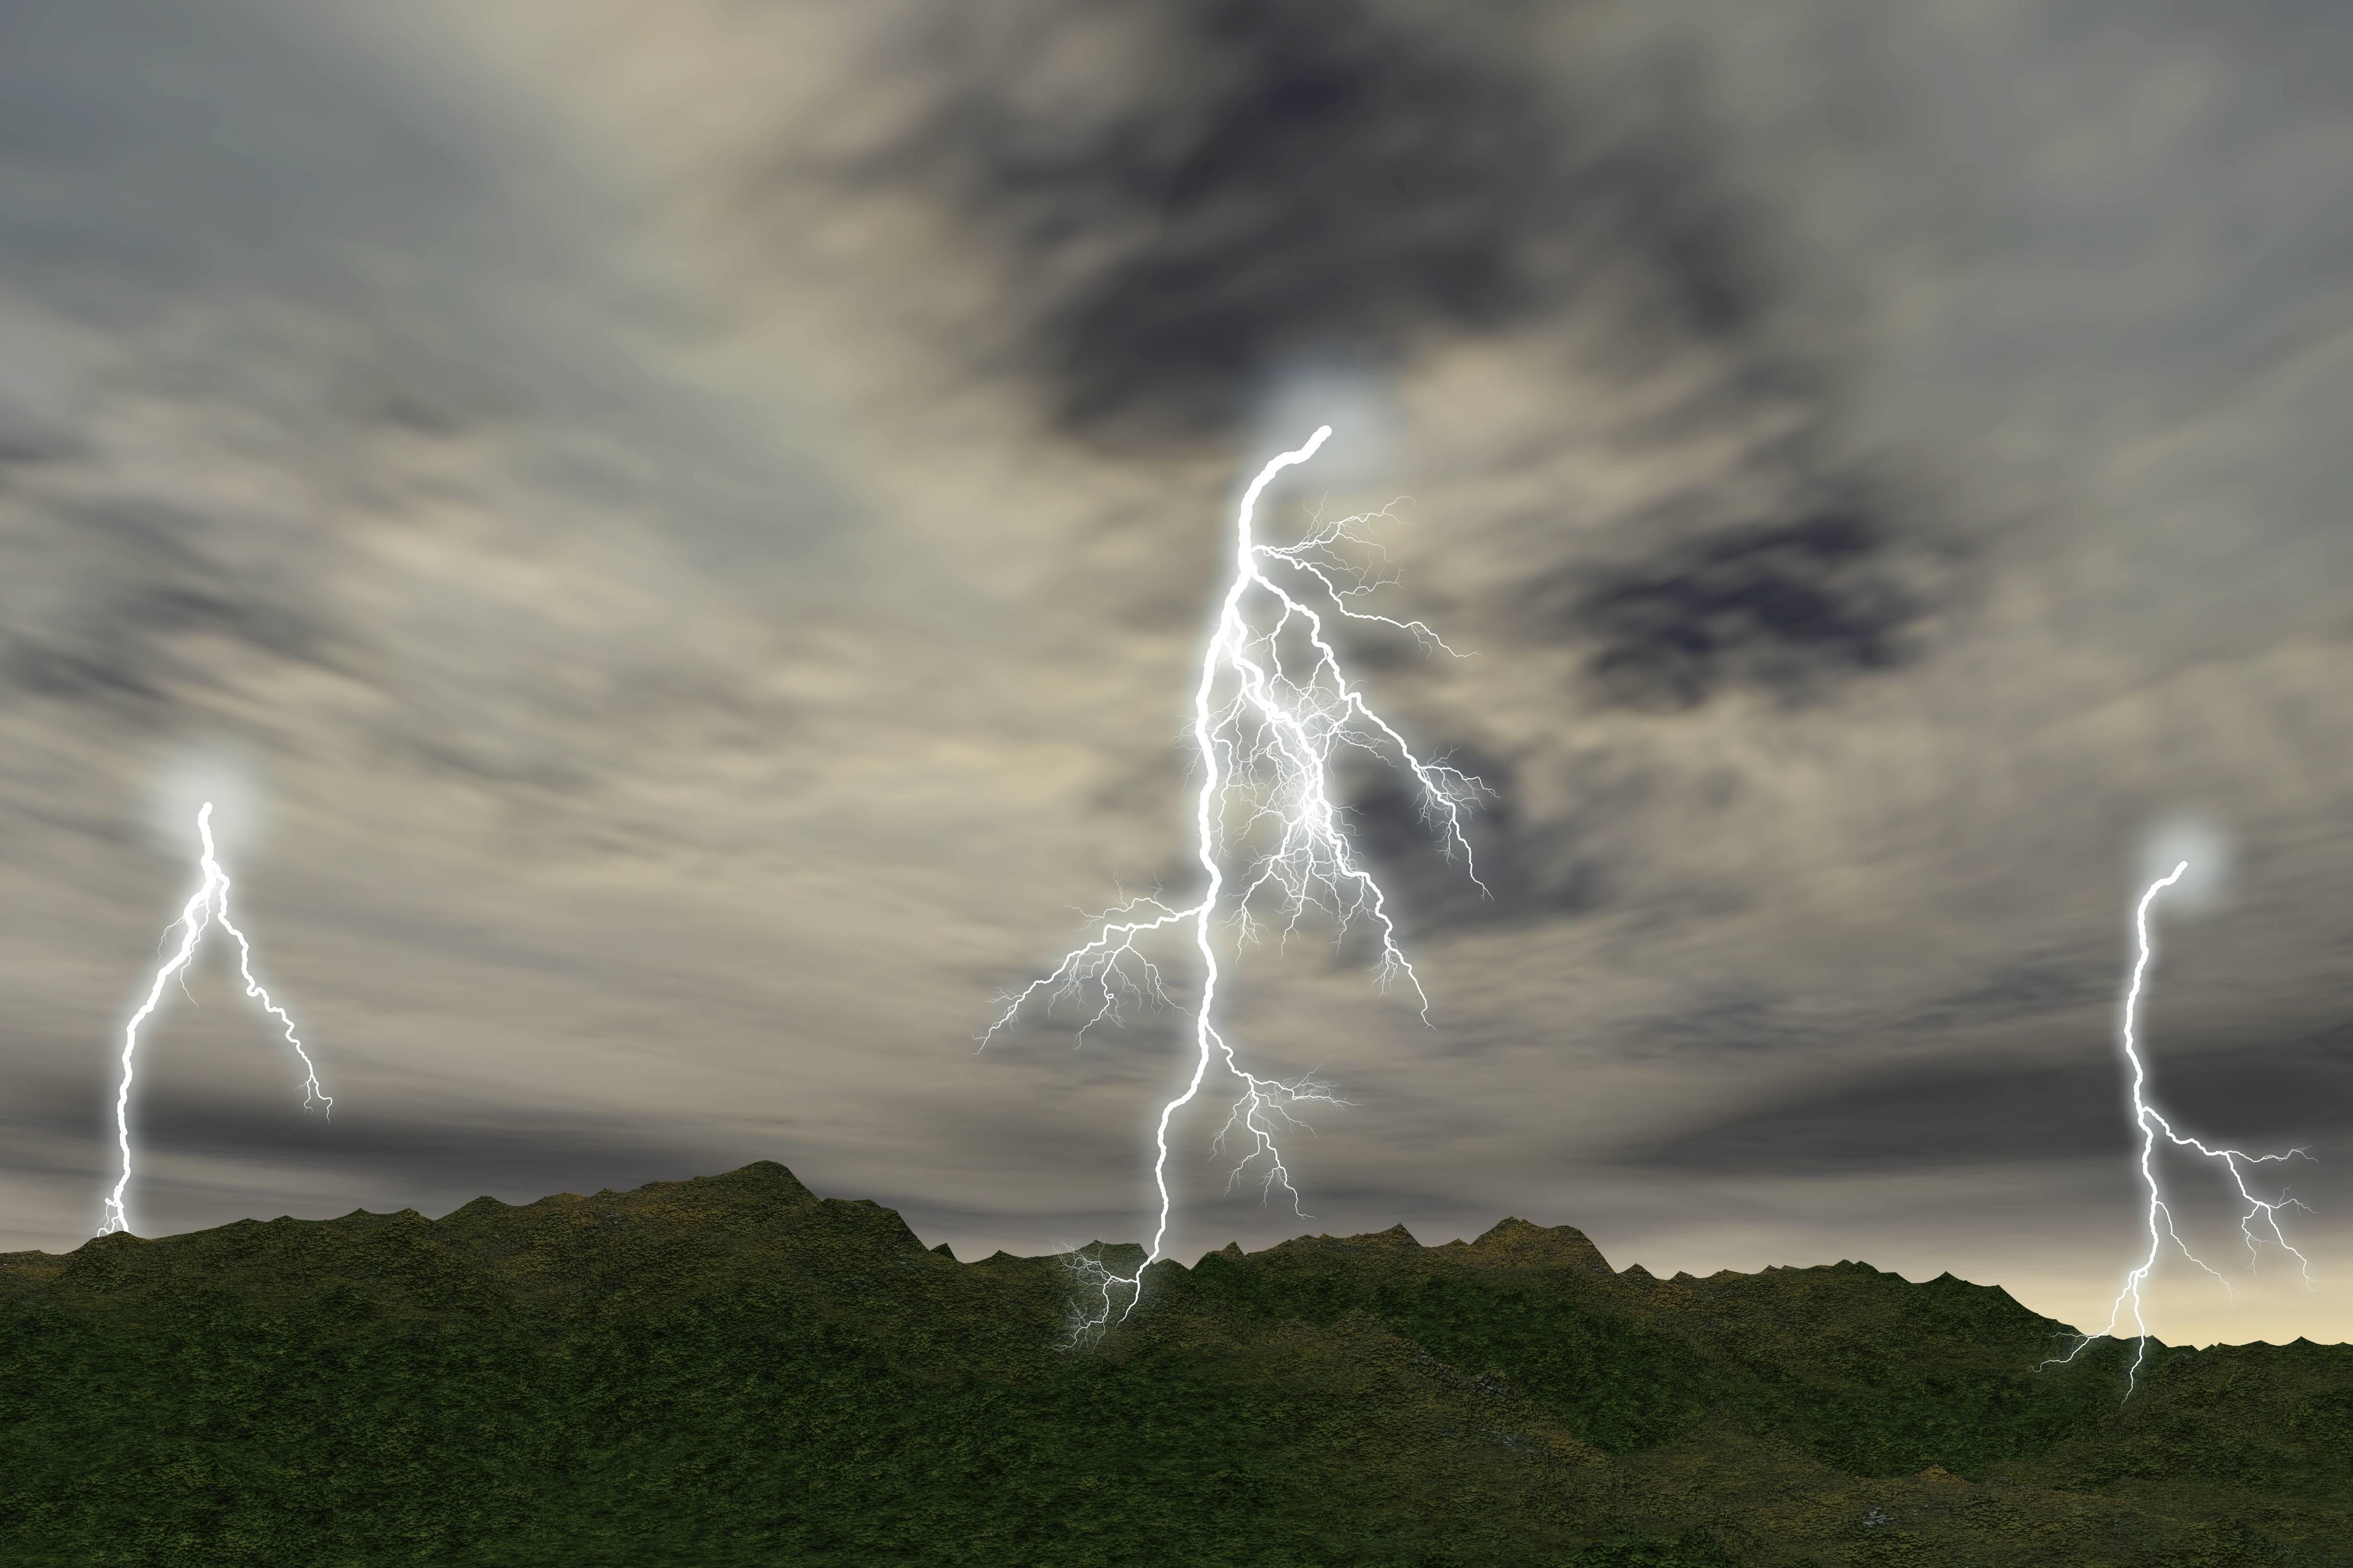 8df85662741046613435_a33f511a5445fc0c5316_Lightning.jpg